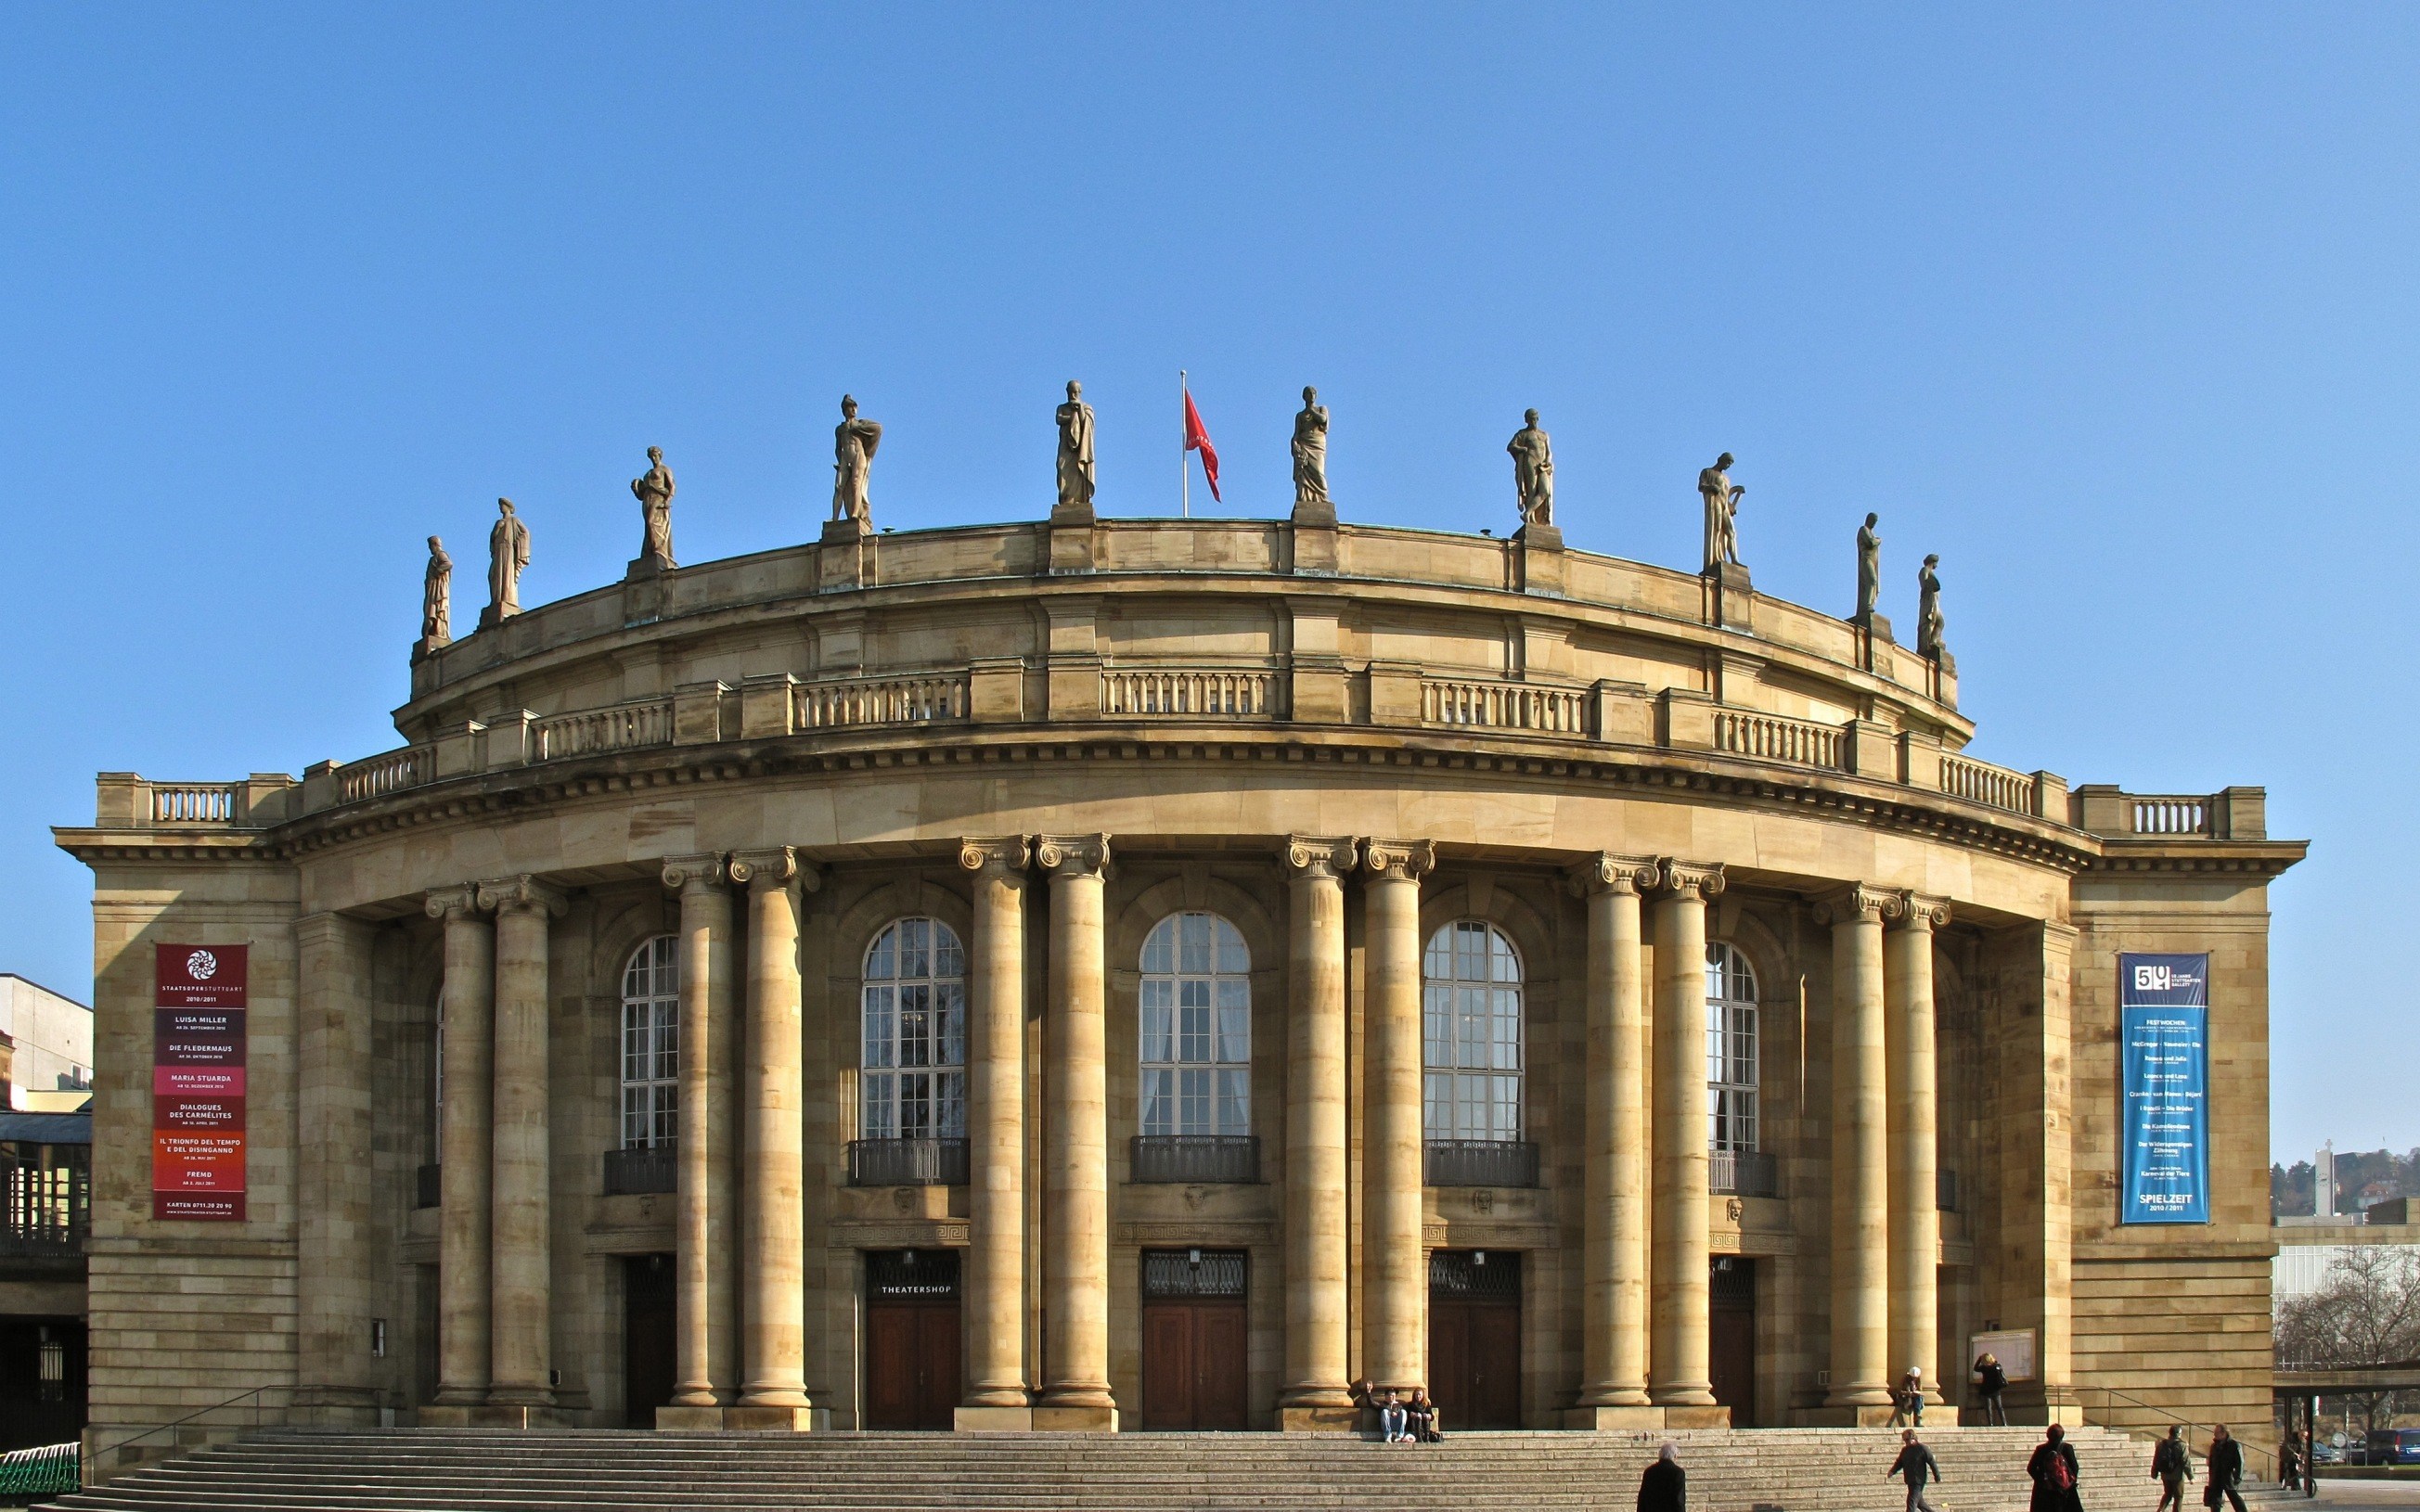 Das Staatstheater Stuttgart im Schlossgarten in der Stuttgarter Innenstadt.